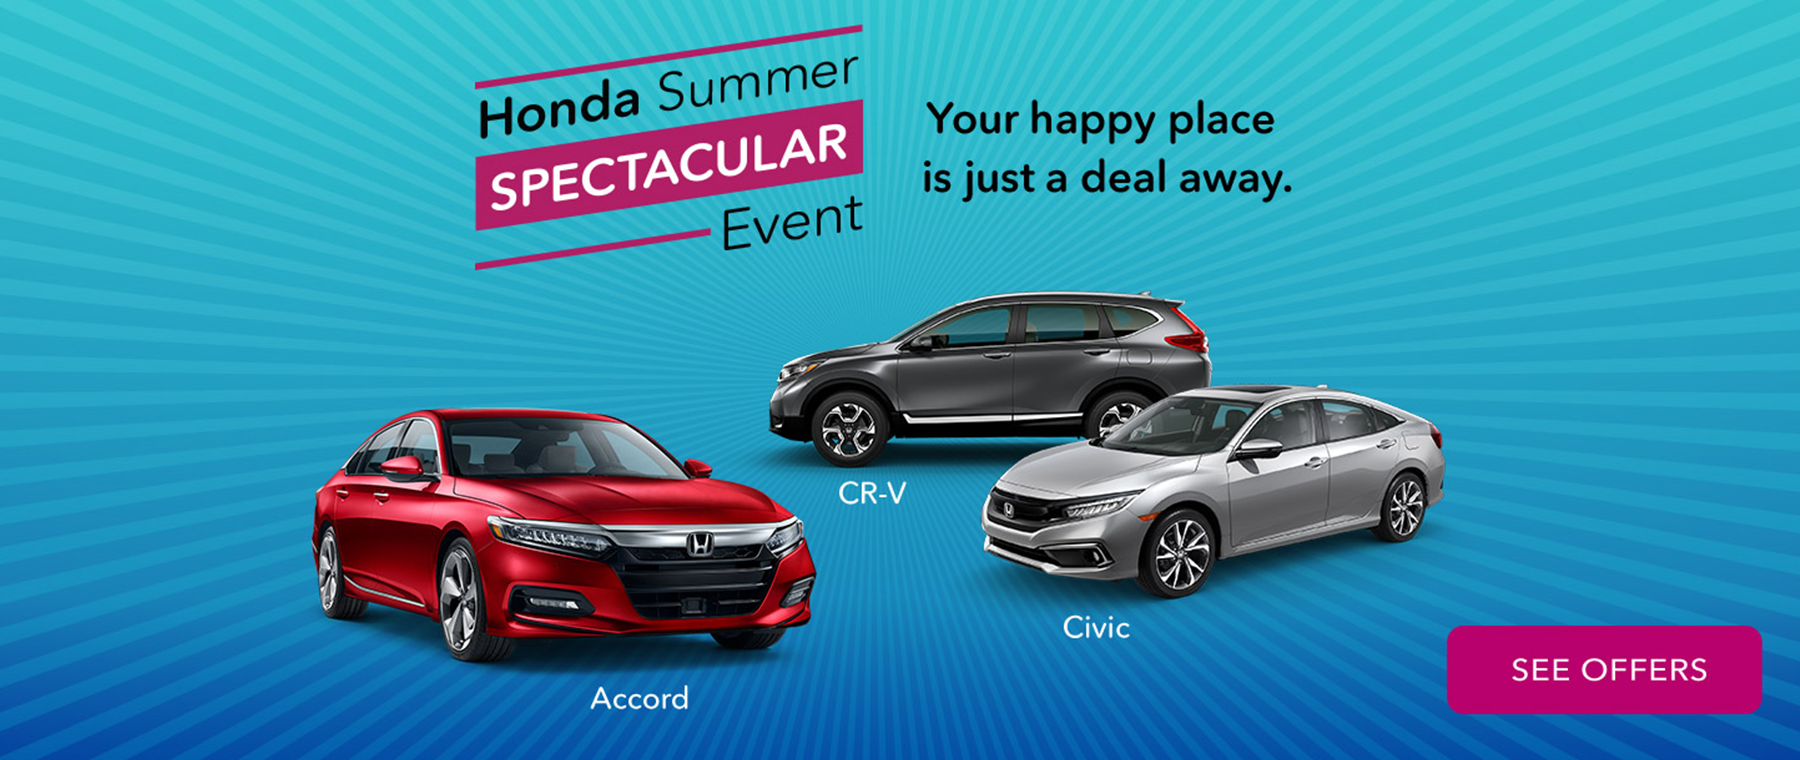 Honda Summer Spectacular Sales Event